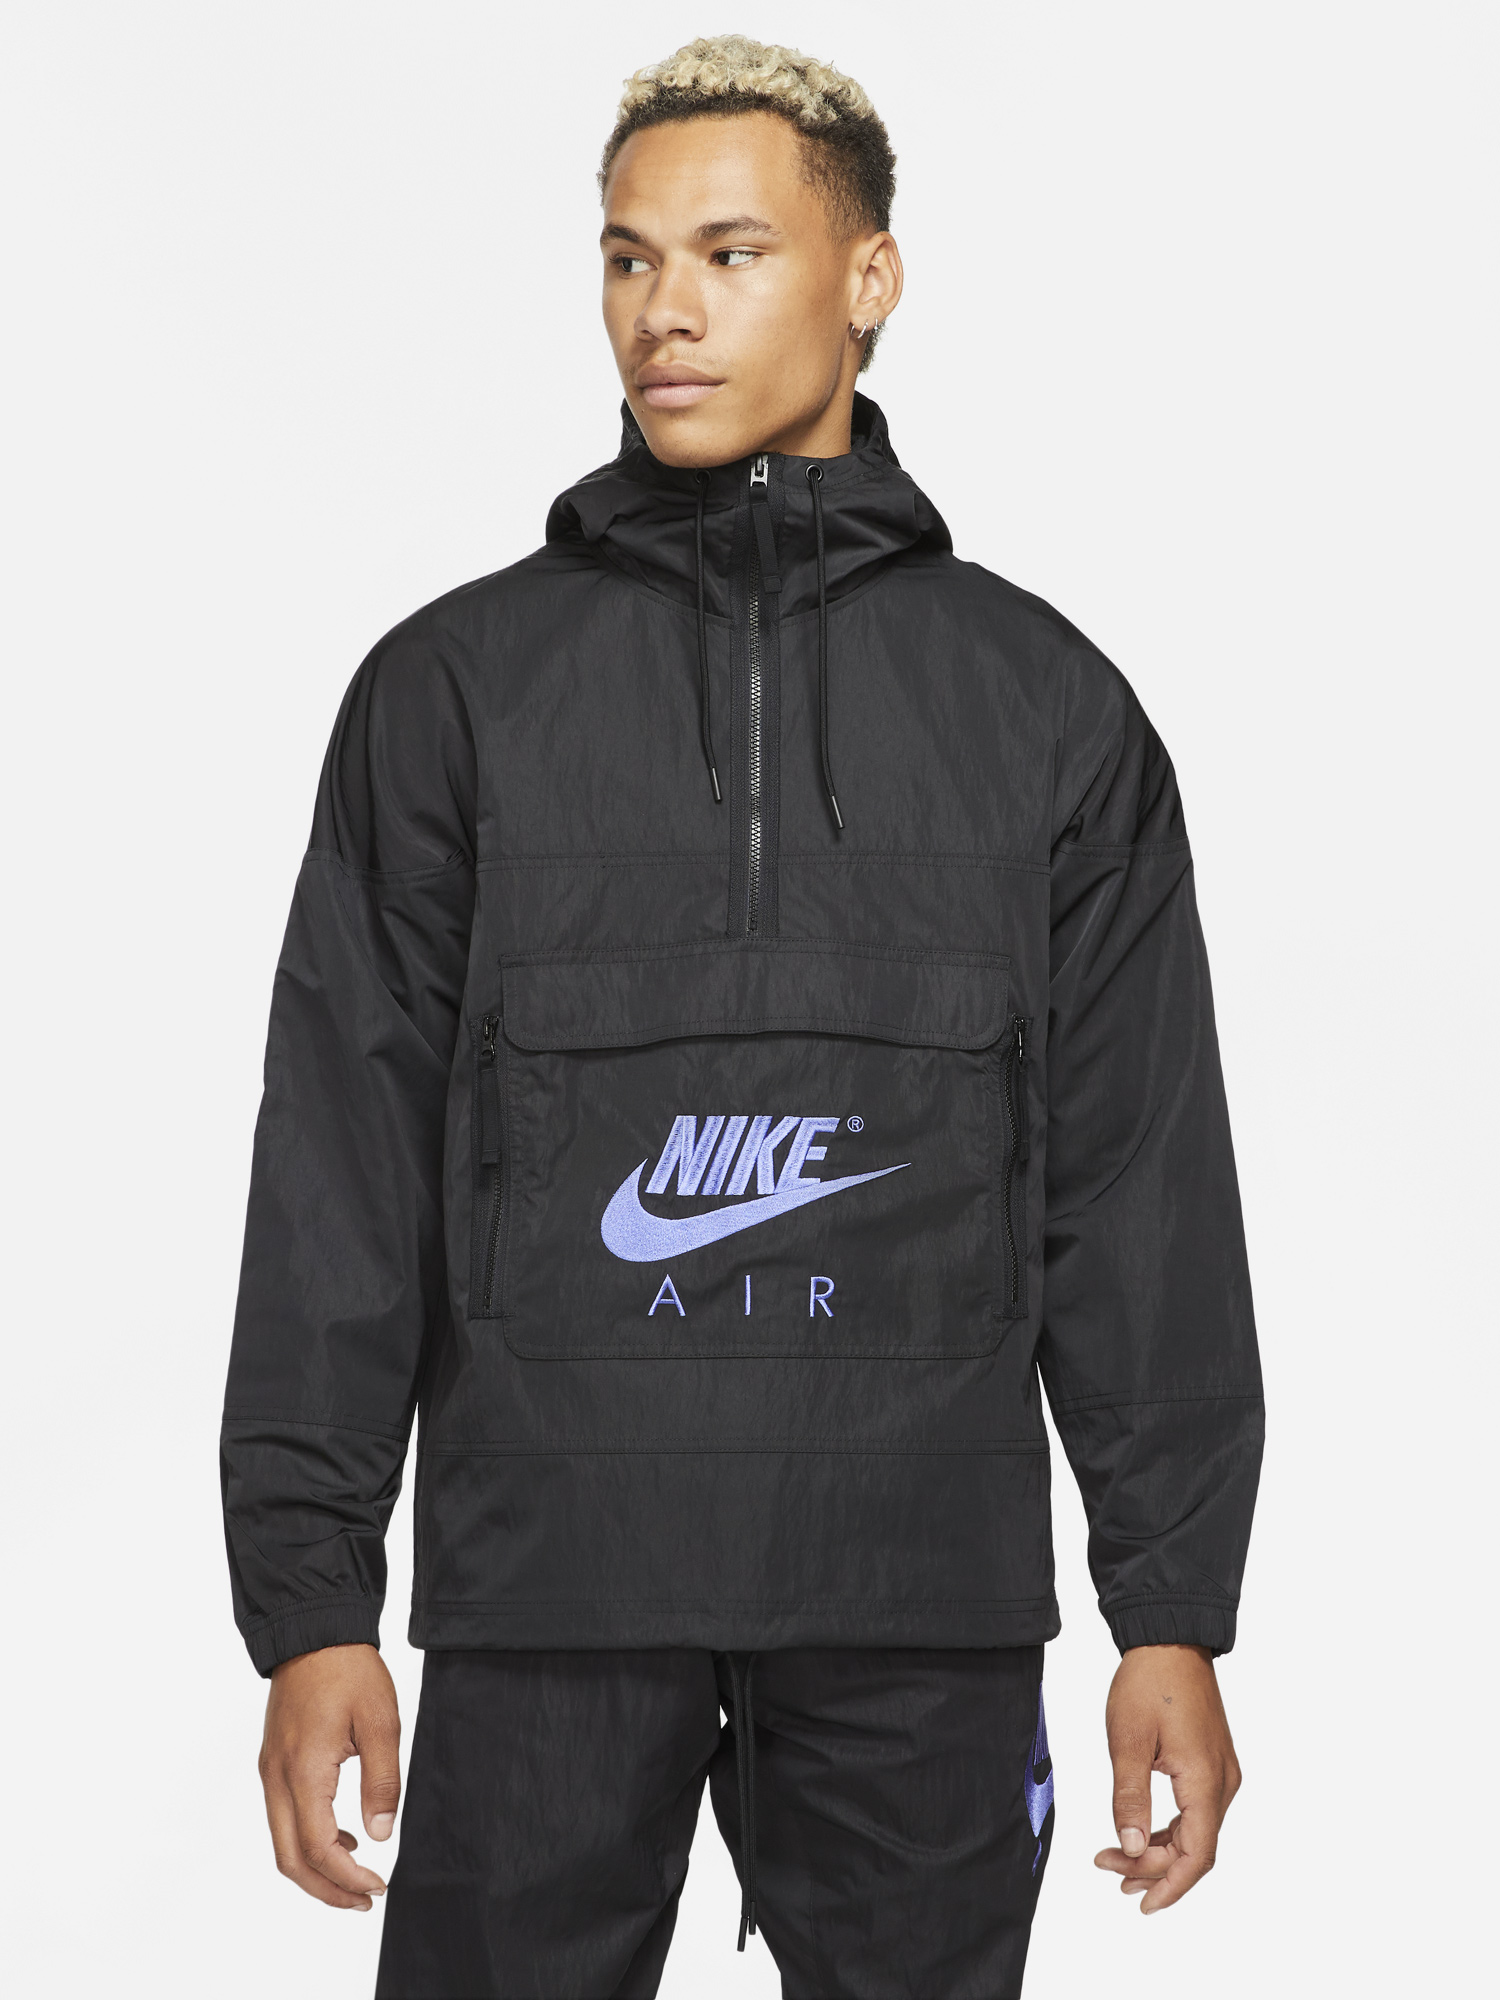 nike-air-persian-violet-jacket-1